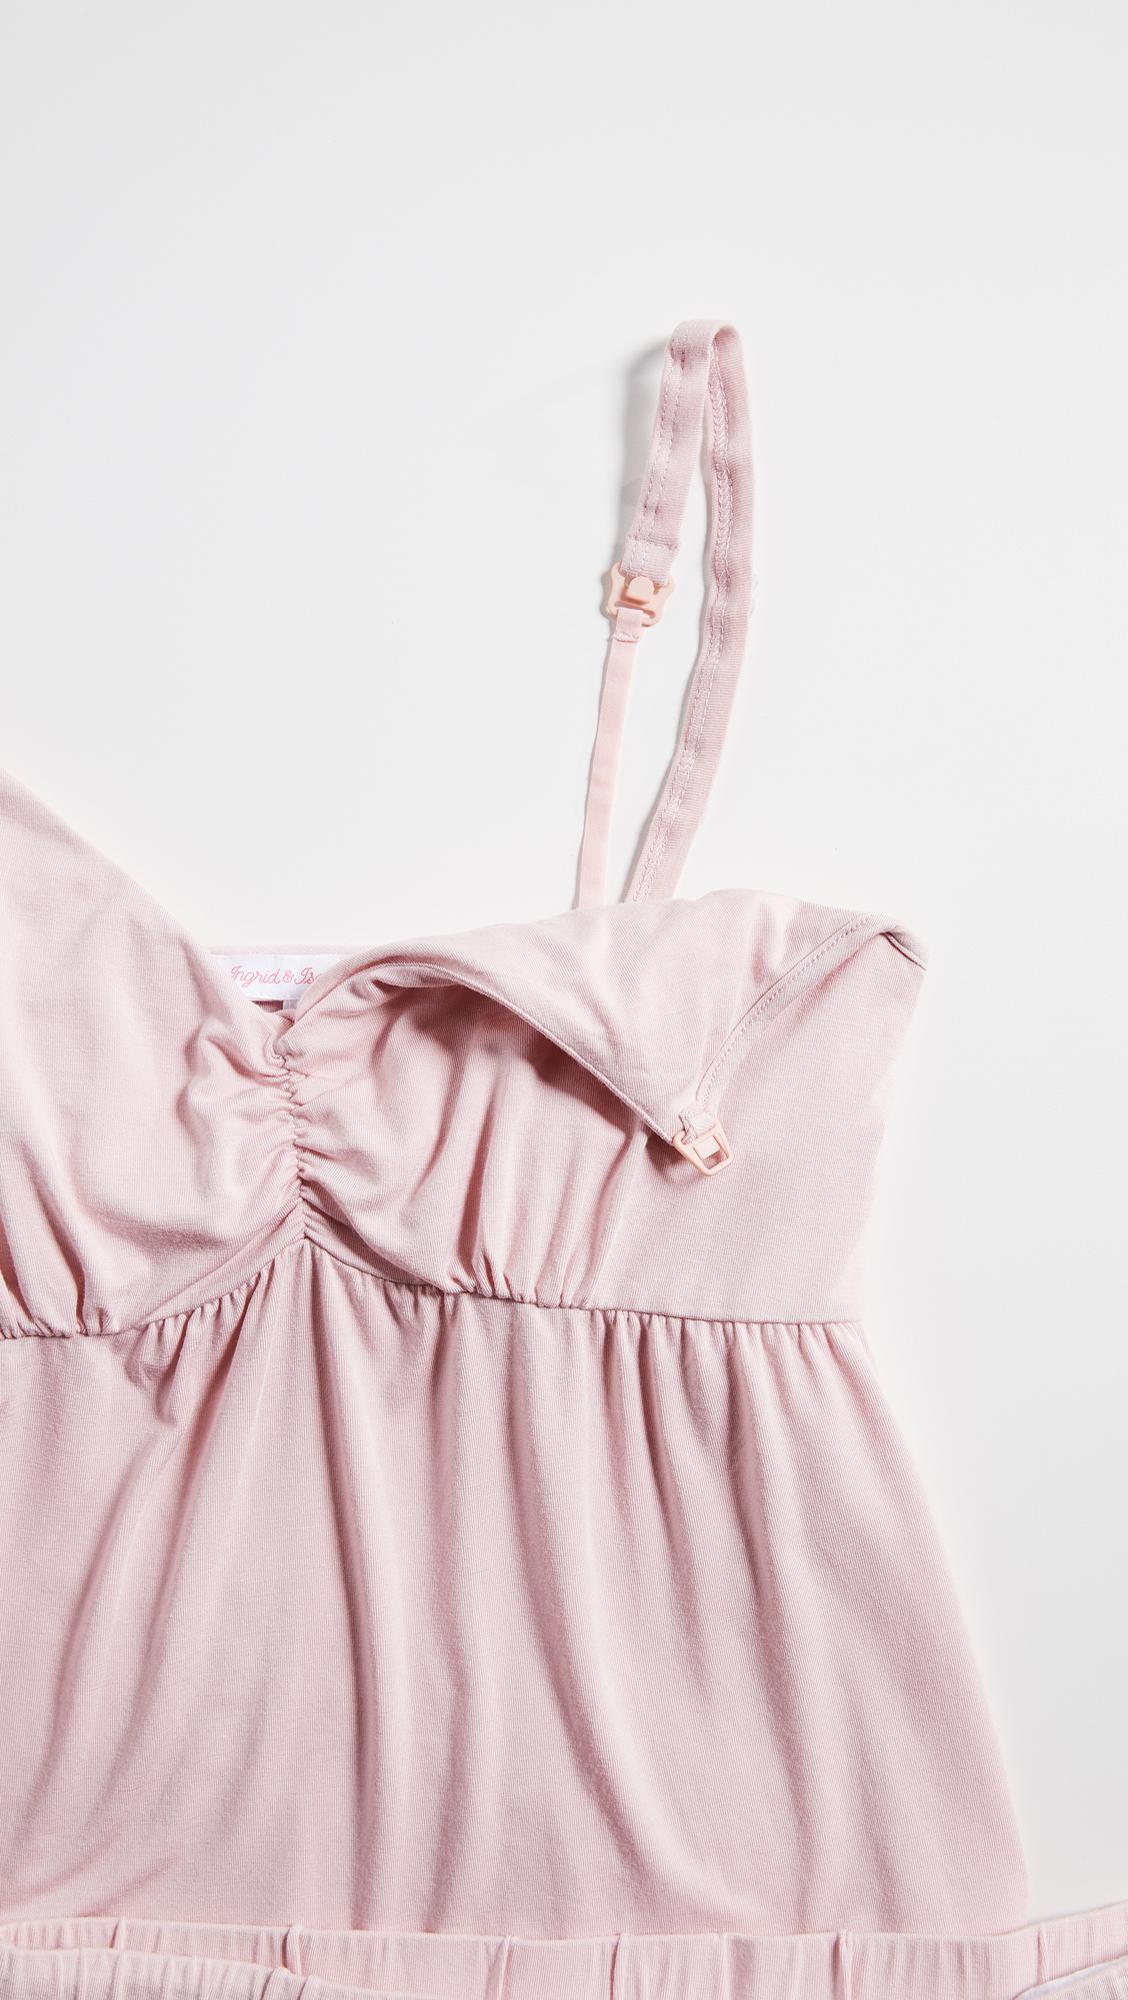 e11fa4de39252 Ingrid & Isabel Maternity Pajama Set in Pink - Lyst